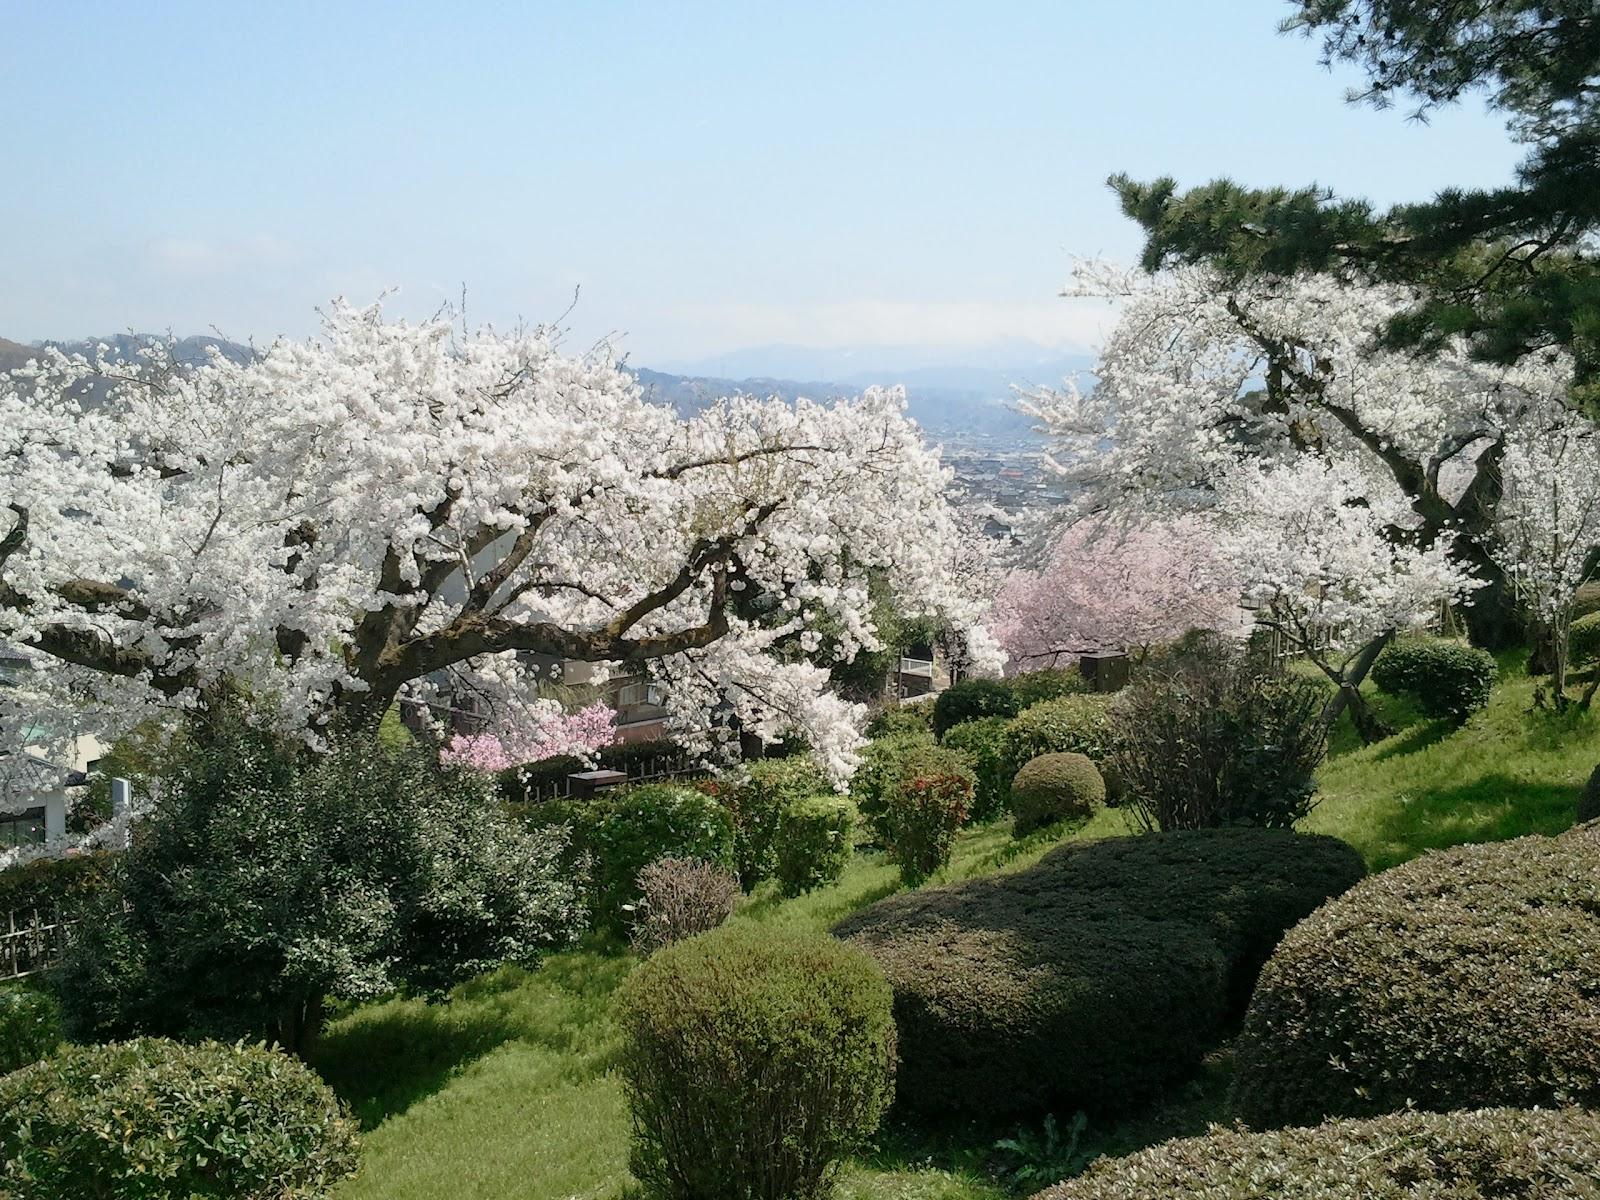 Tripping: Kanazawa Castle, Kenrokuen Garden